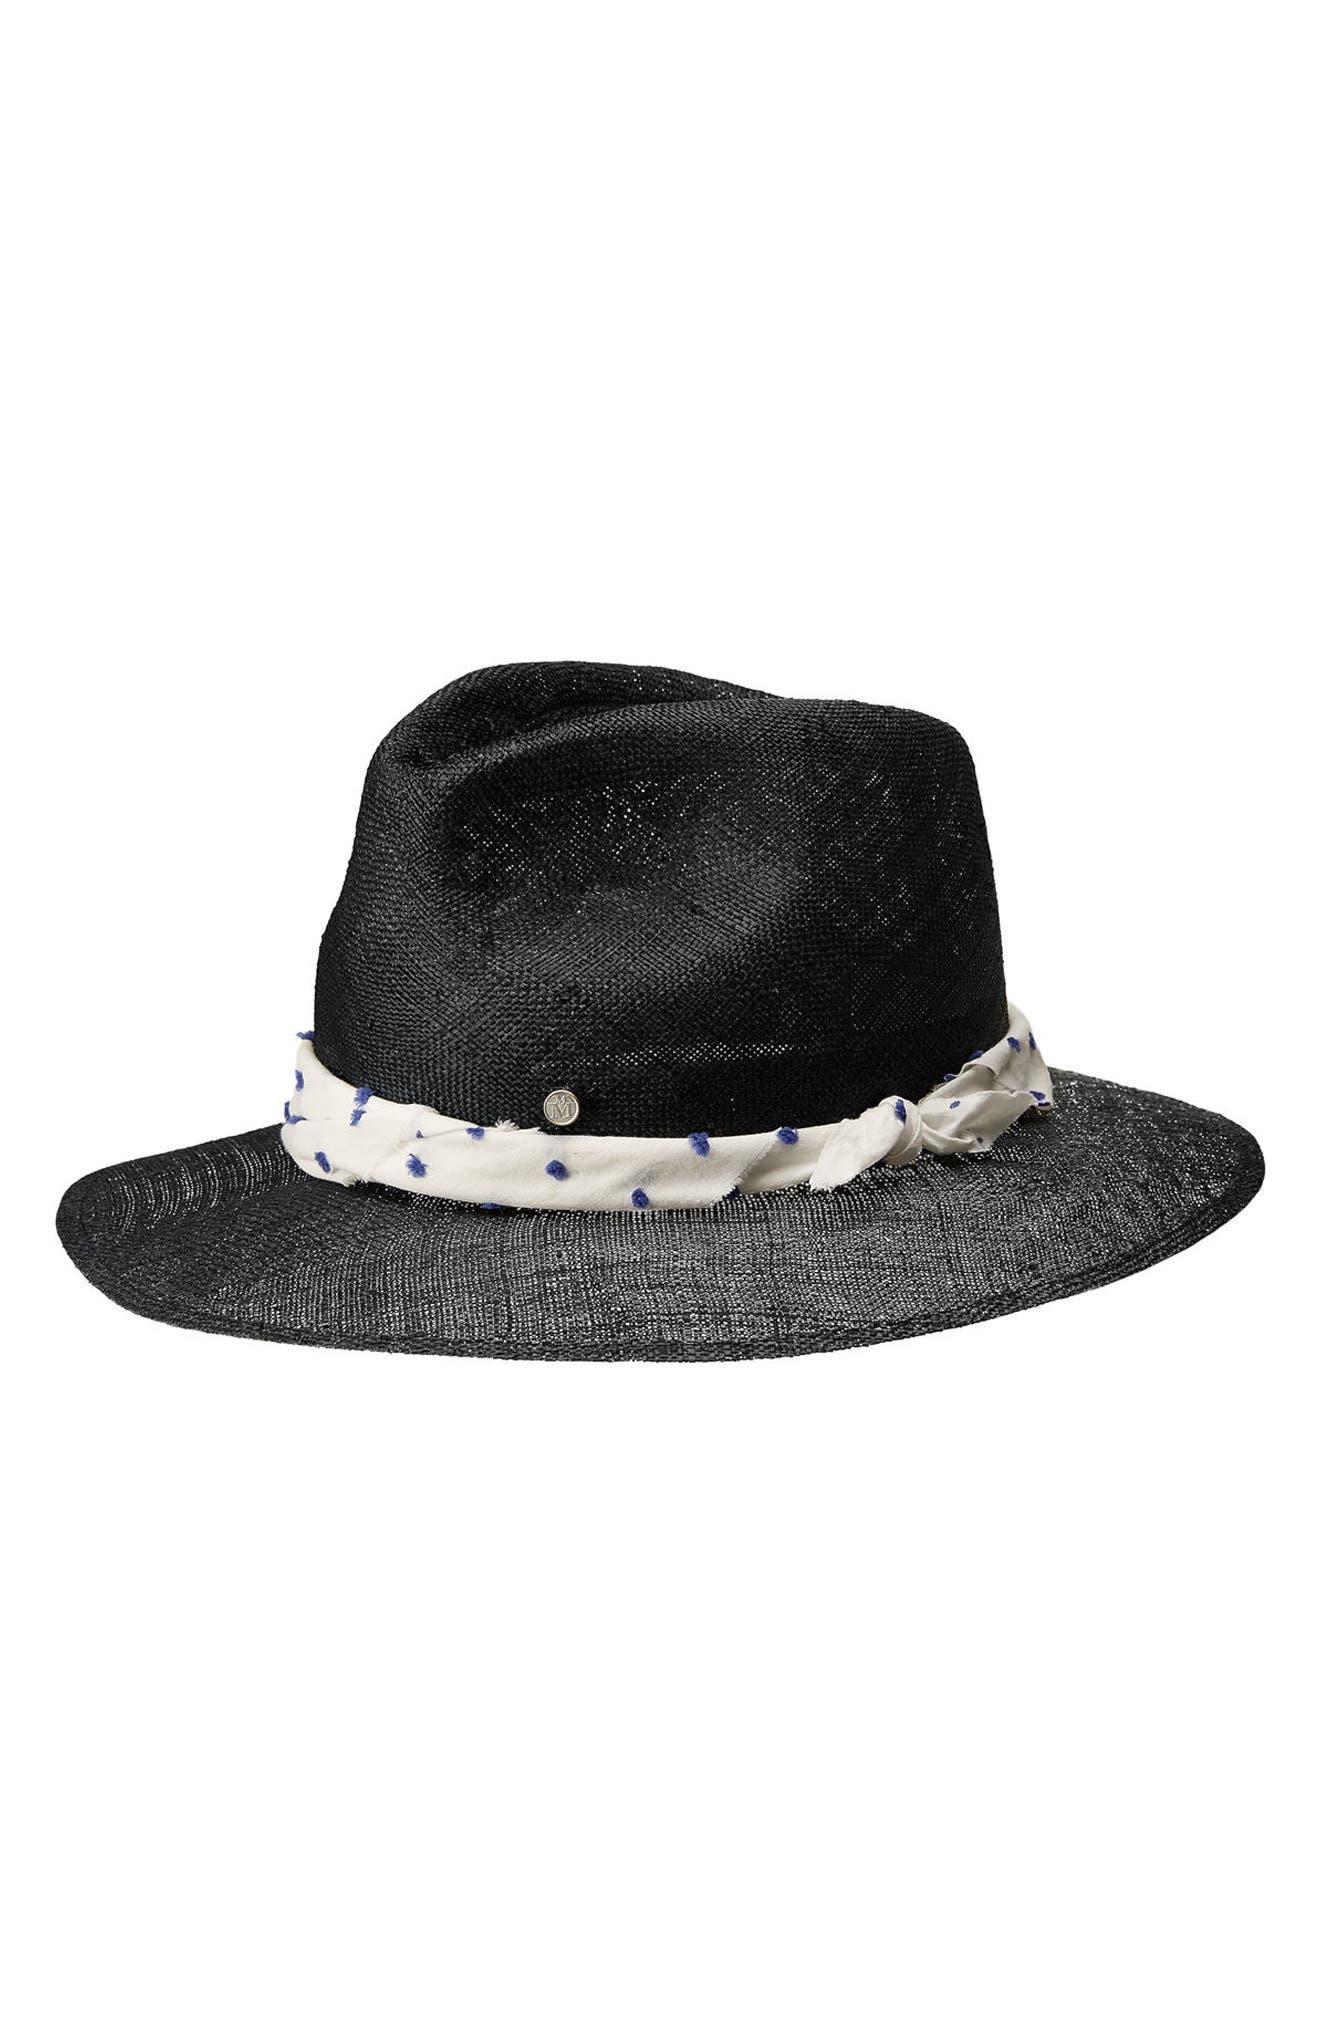 Main Image - Maison Michel Rico Straw Hat